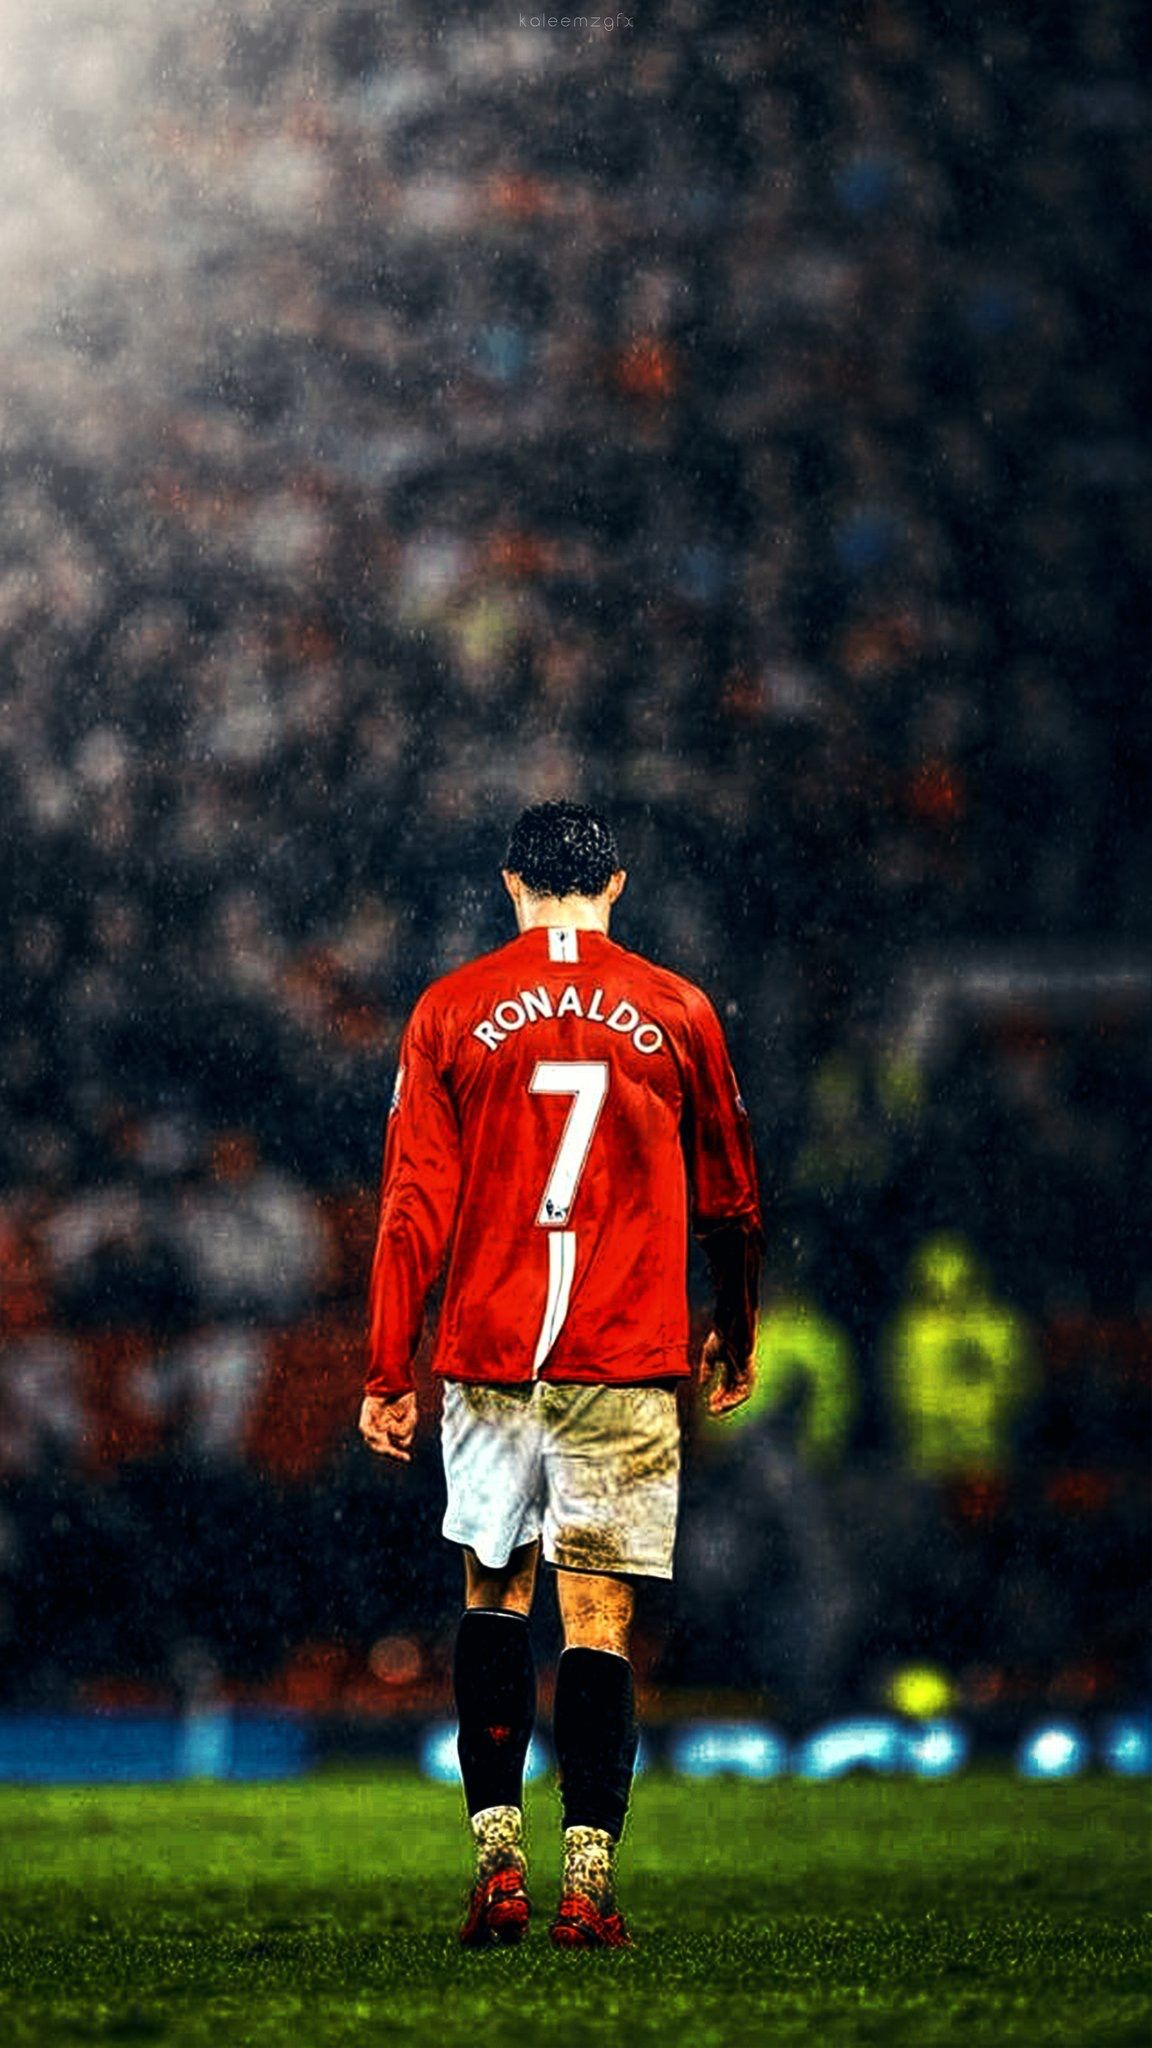 Manunited Uefa Cristiano Ronaldo Manchester United Wallpaper Photo